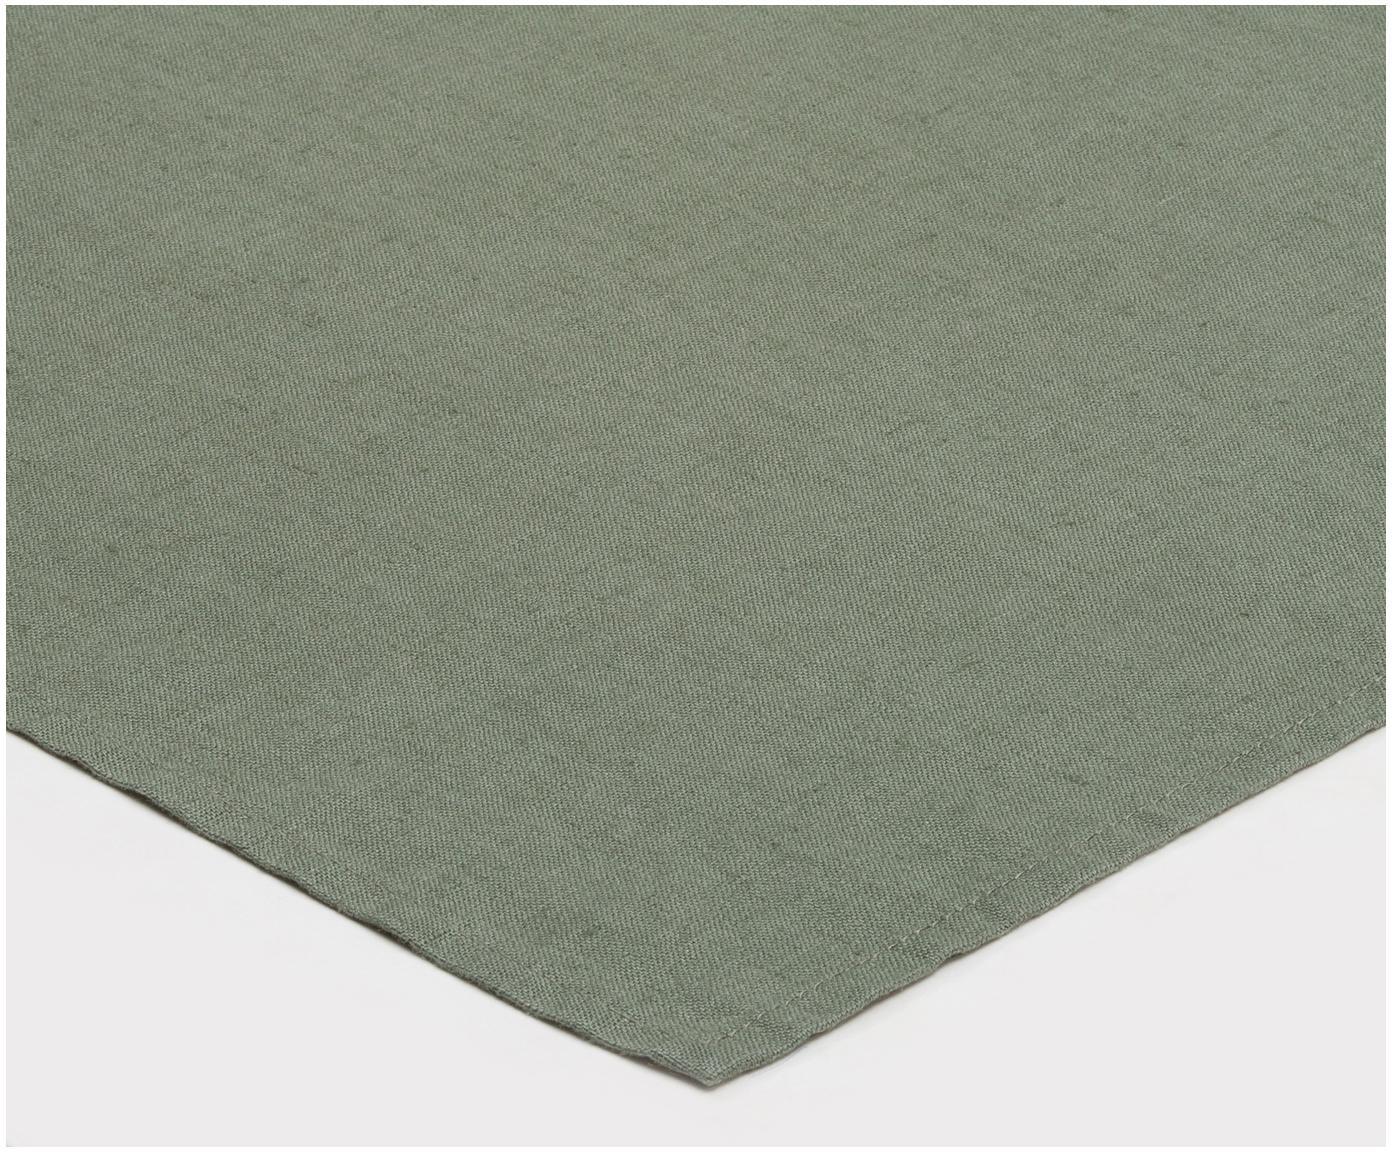 Leinen-Servietten Sunshine, 4 Stück, Leinen, Grün, 45 x 45 cm